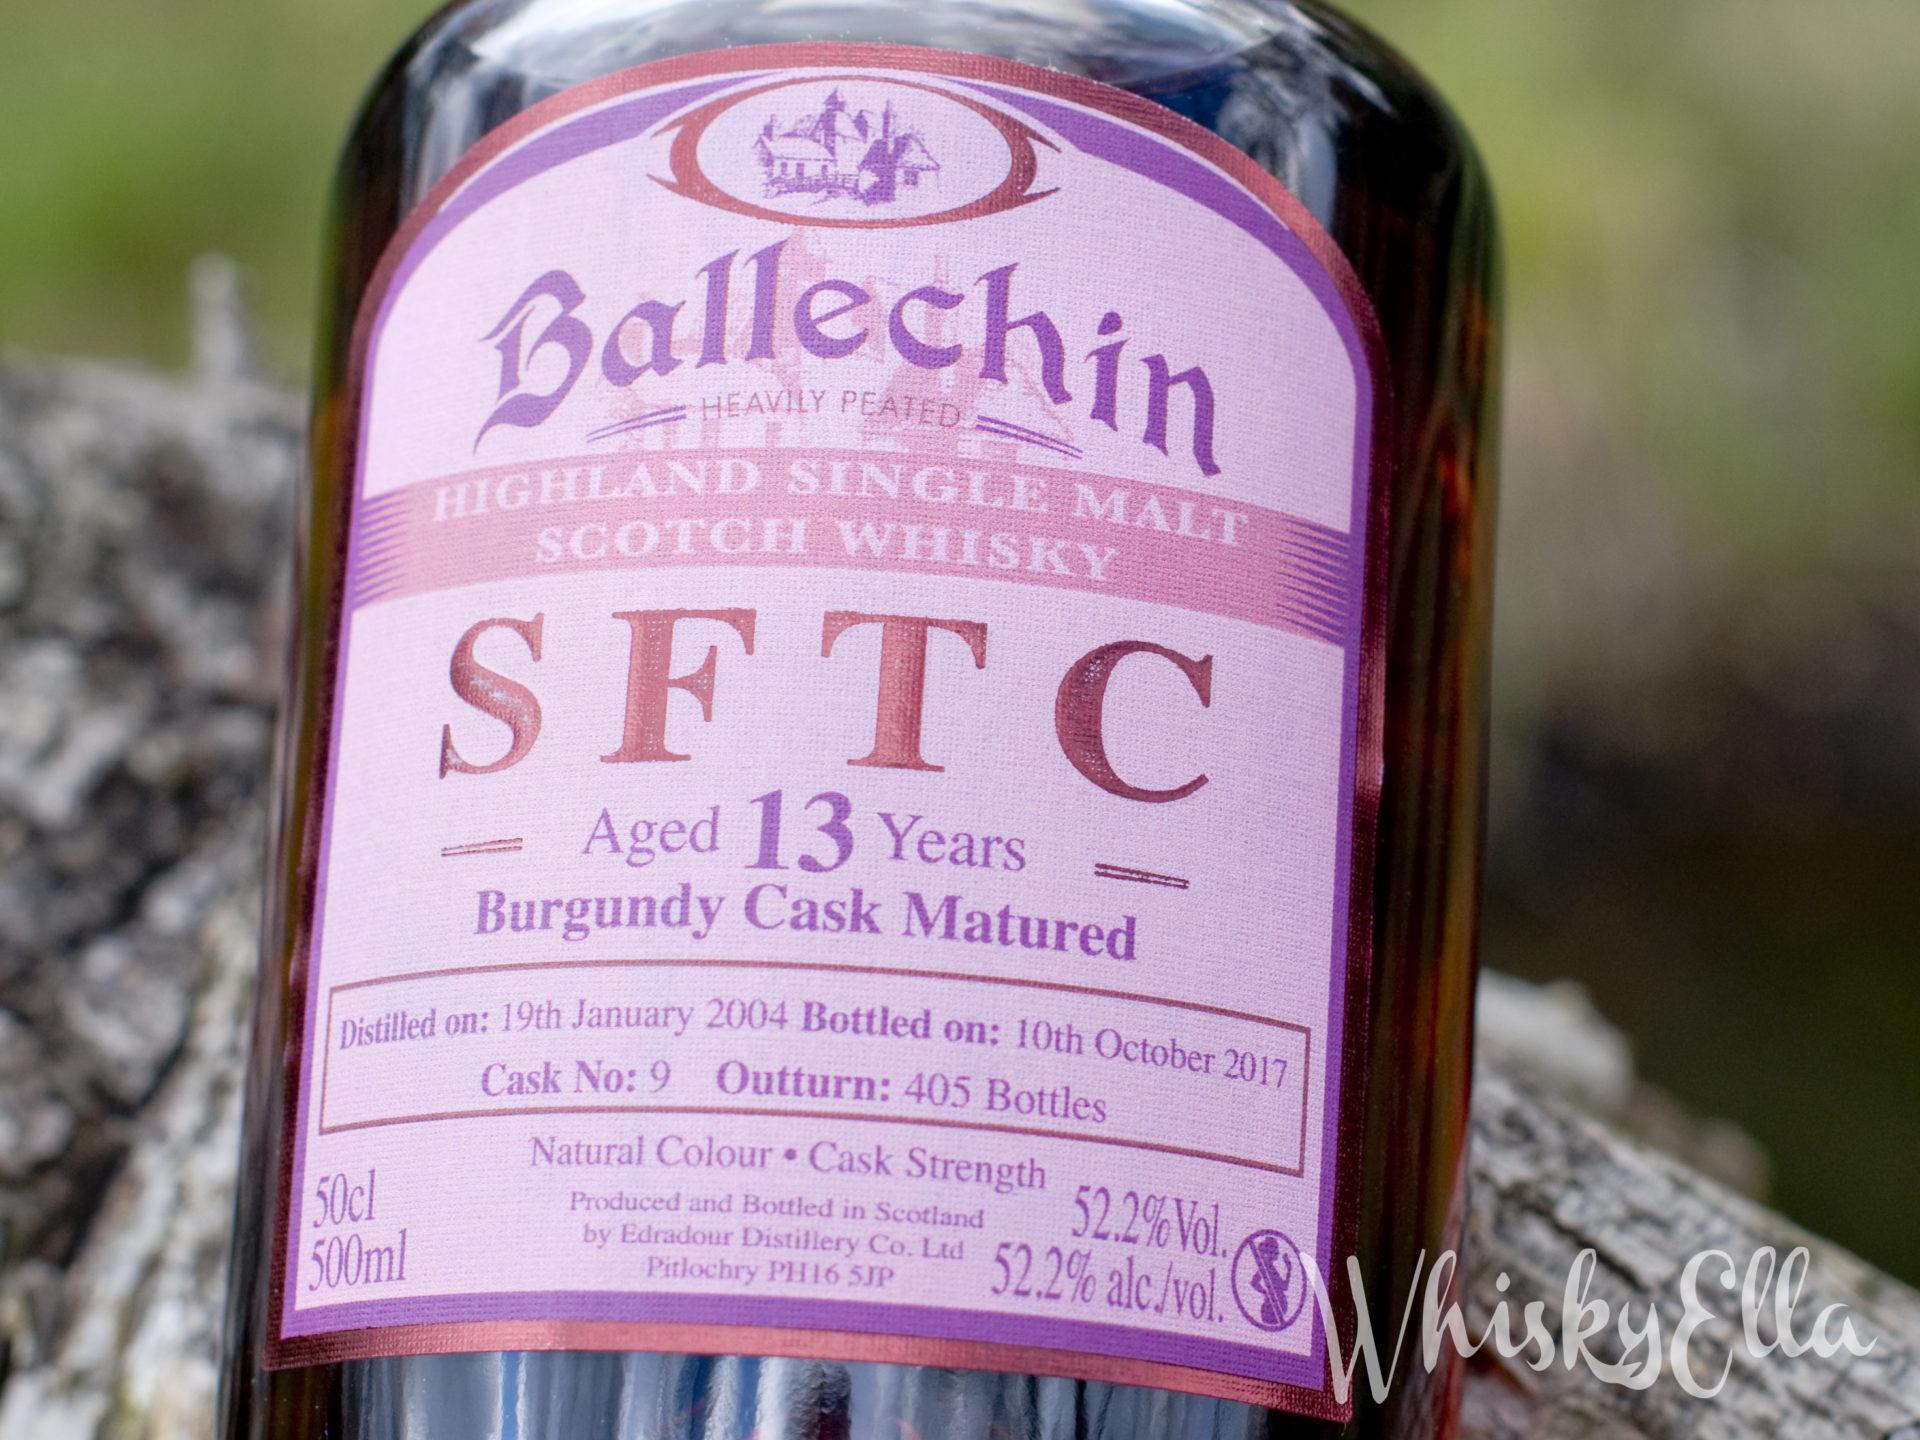 Nasza recenzja Edradour Ballechin SFTC 13 yo Burgundy Cask Matured 52,2% Cask No: 9 #31